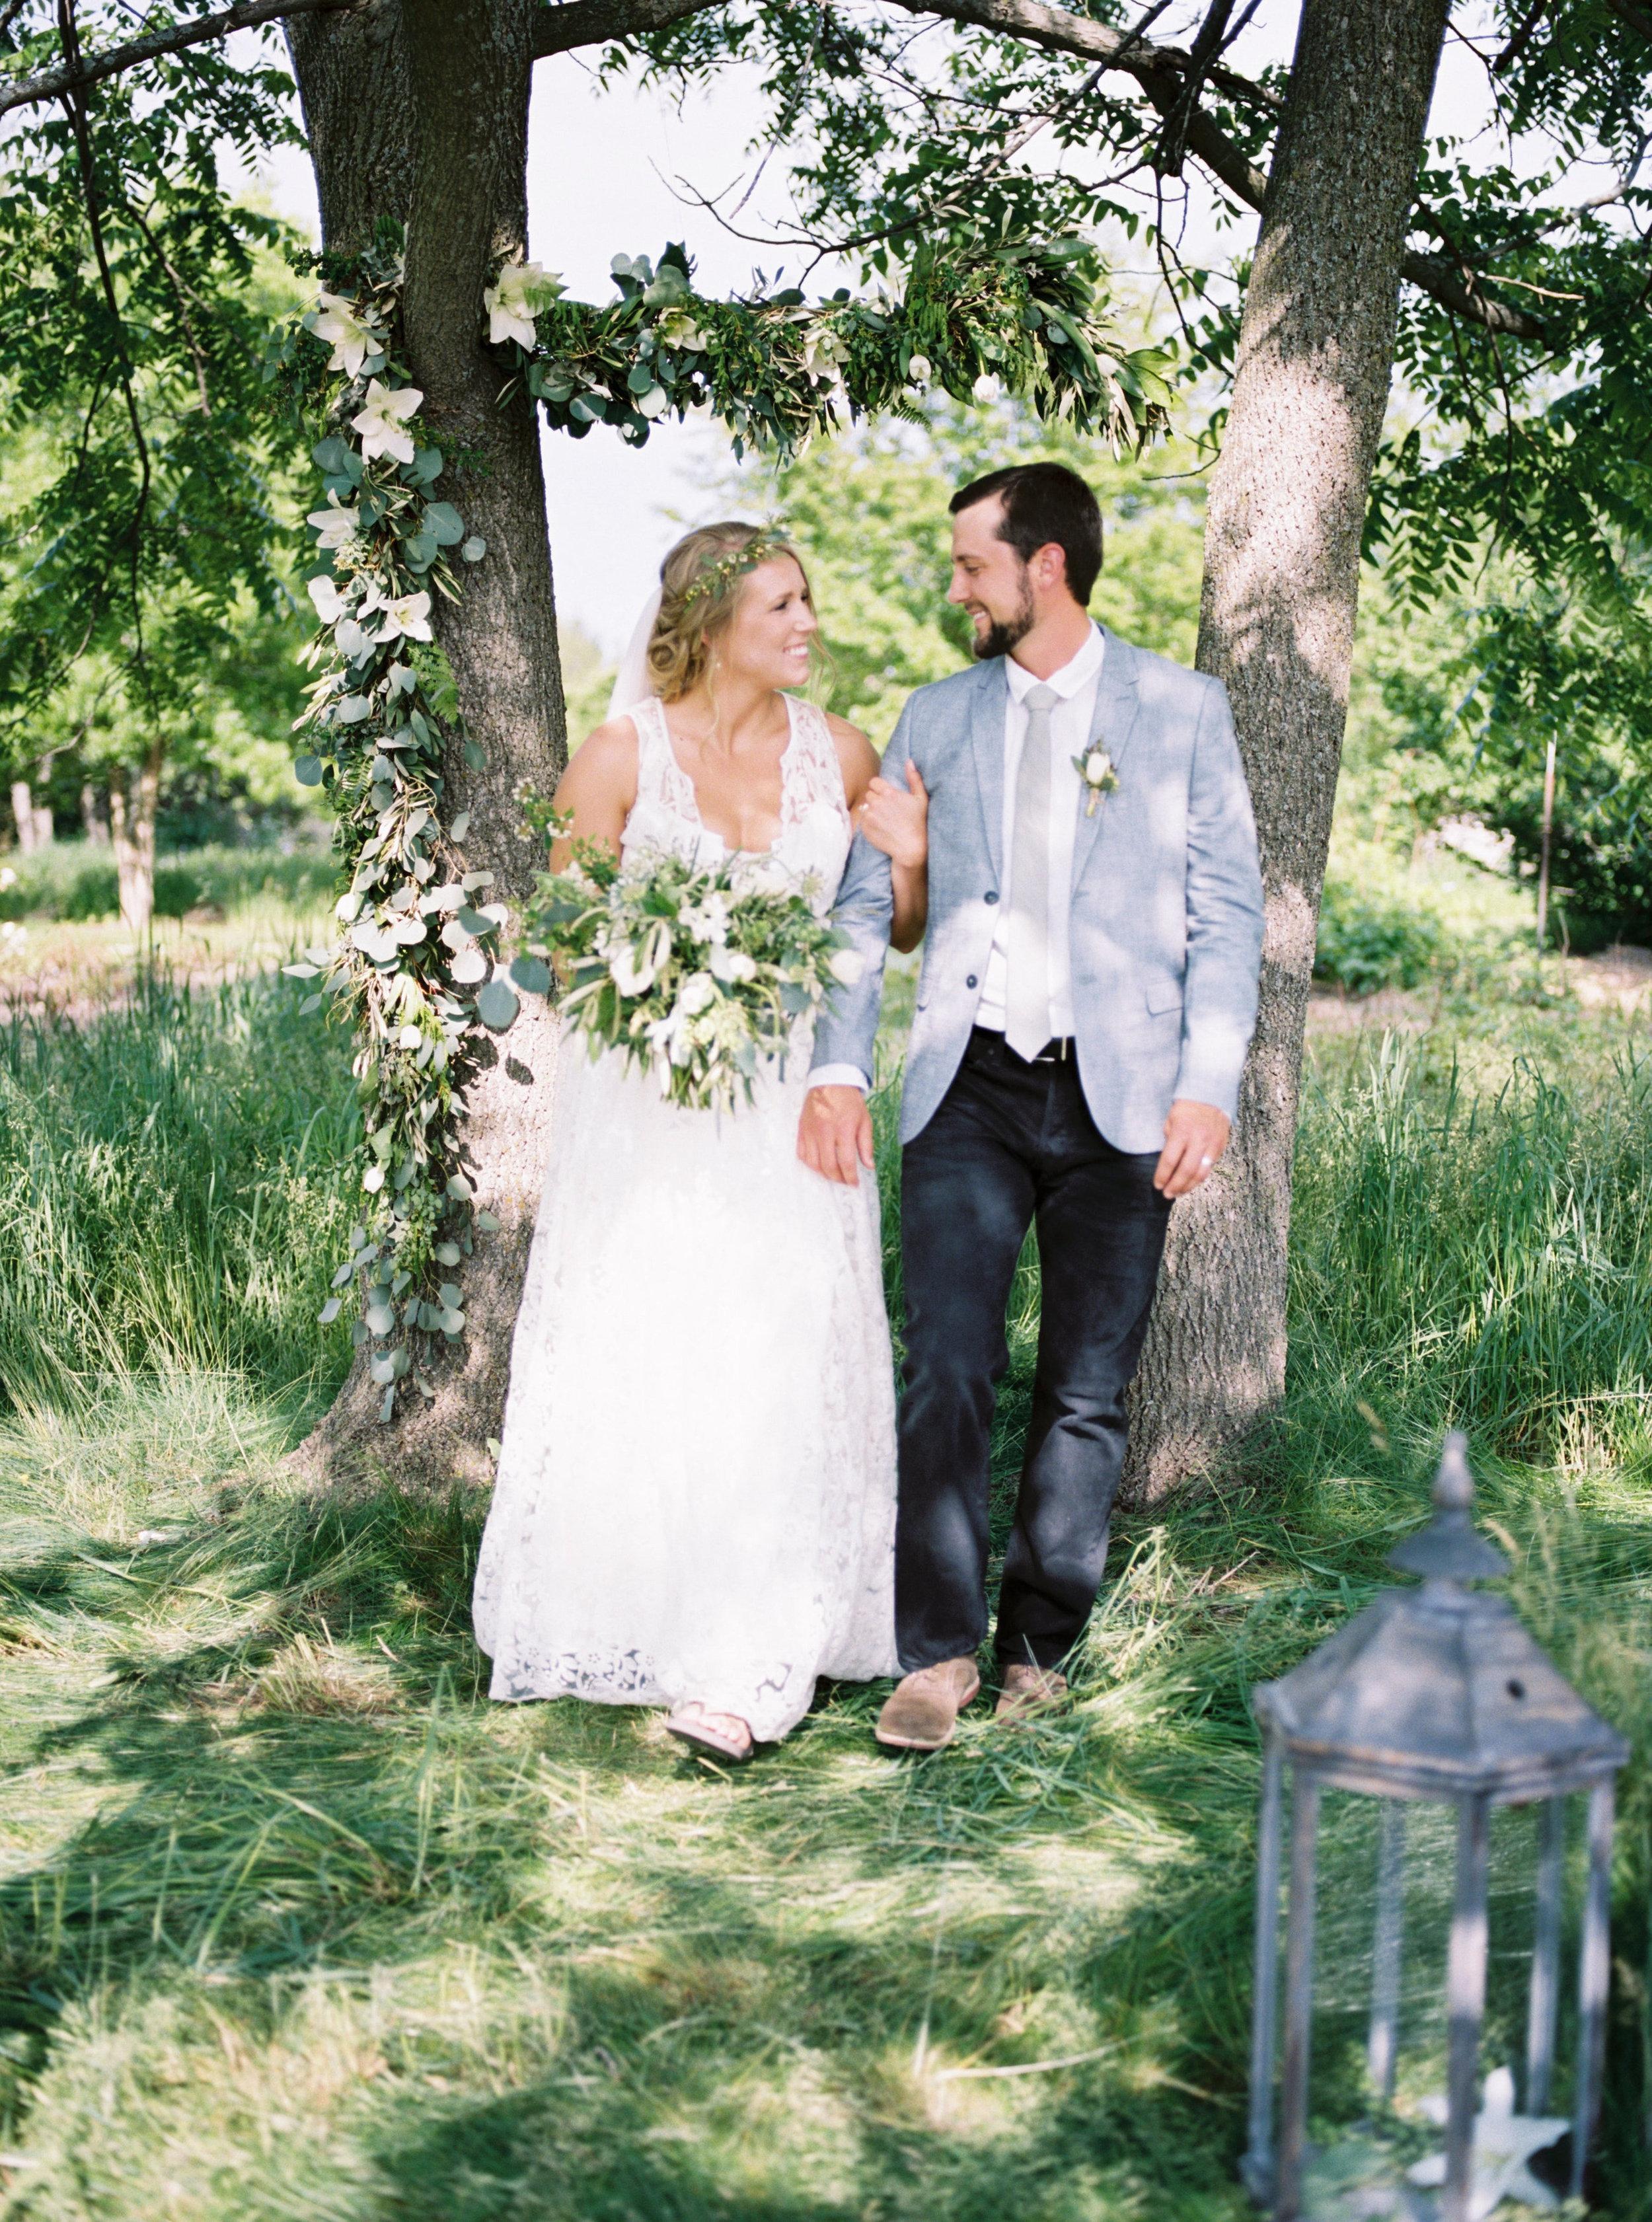 greenhouse-wedding-inspiration-by-laurelyn-savannah-photography-95.jpg